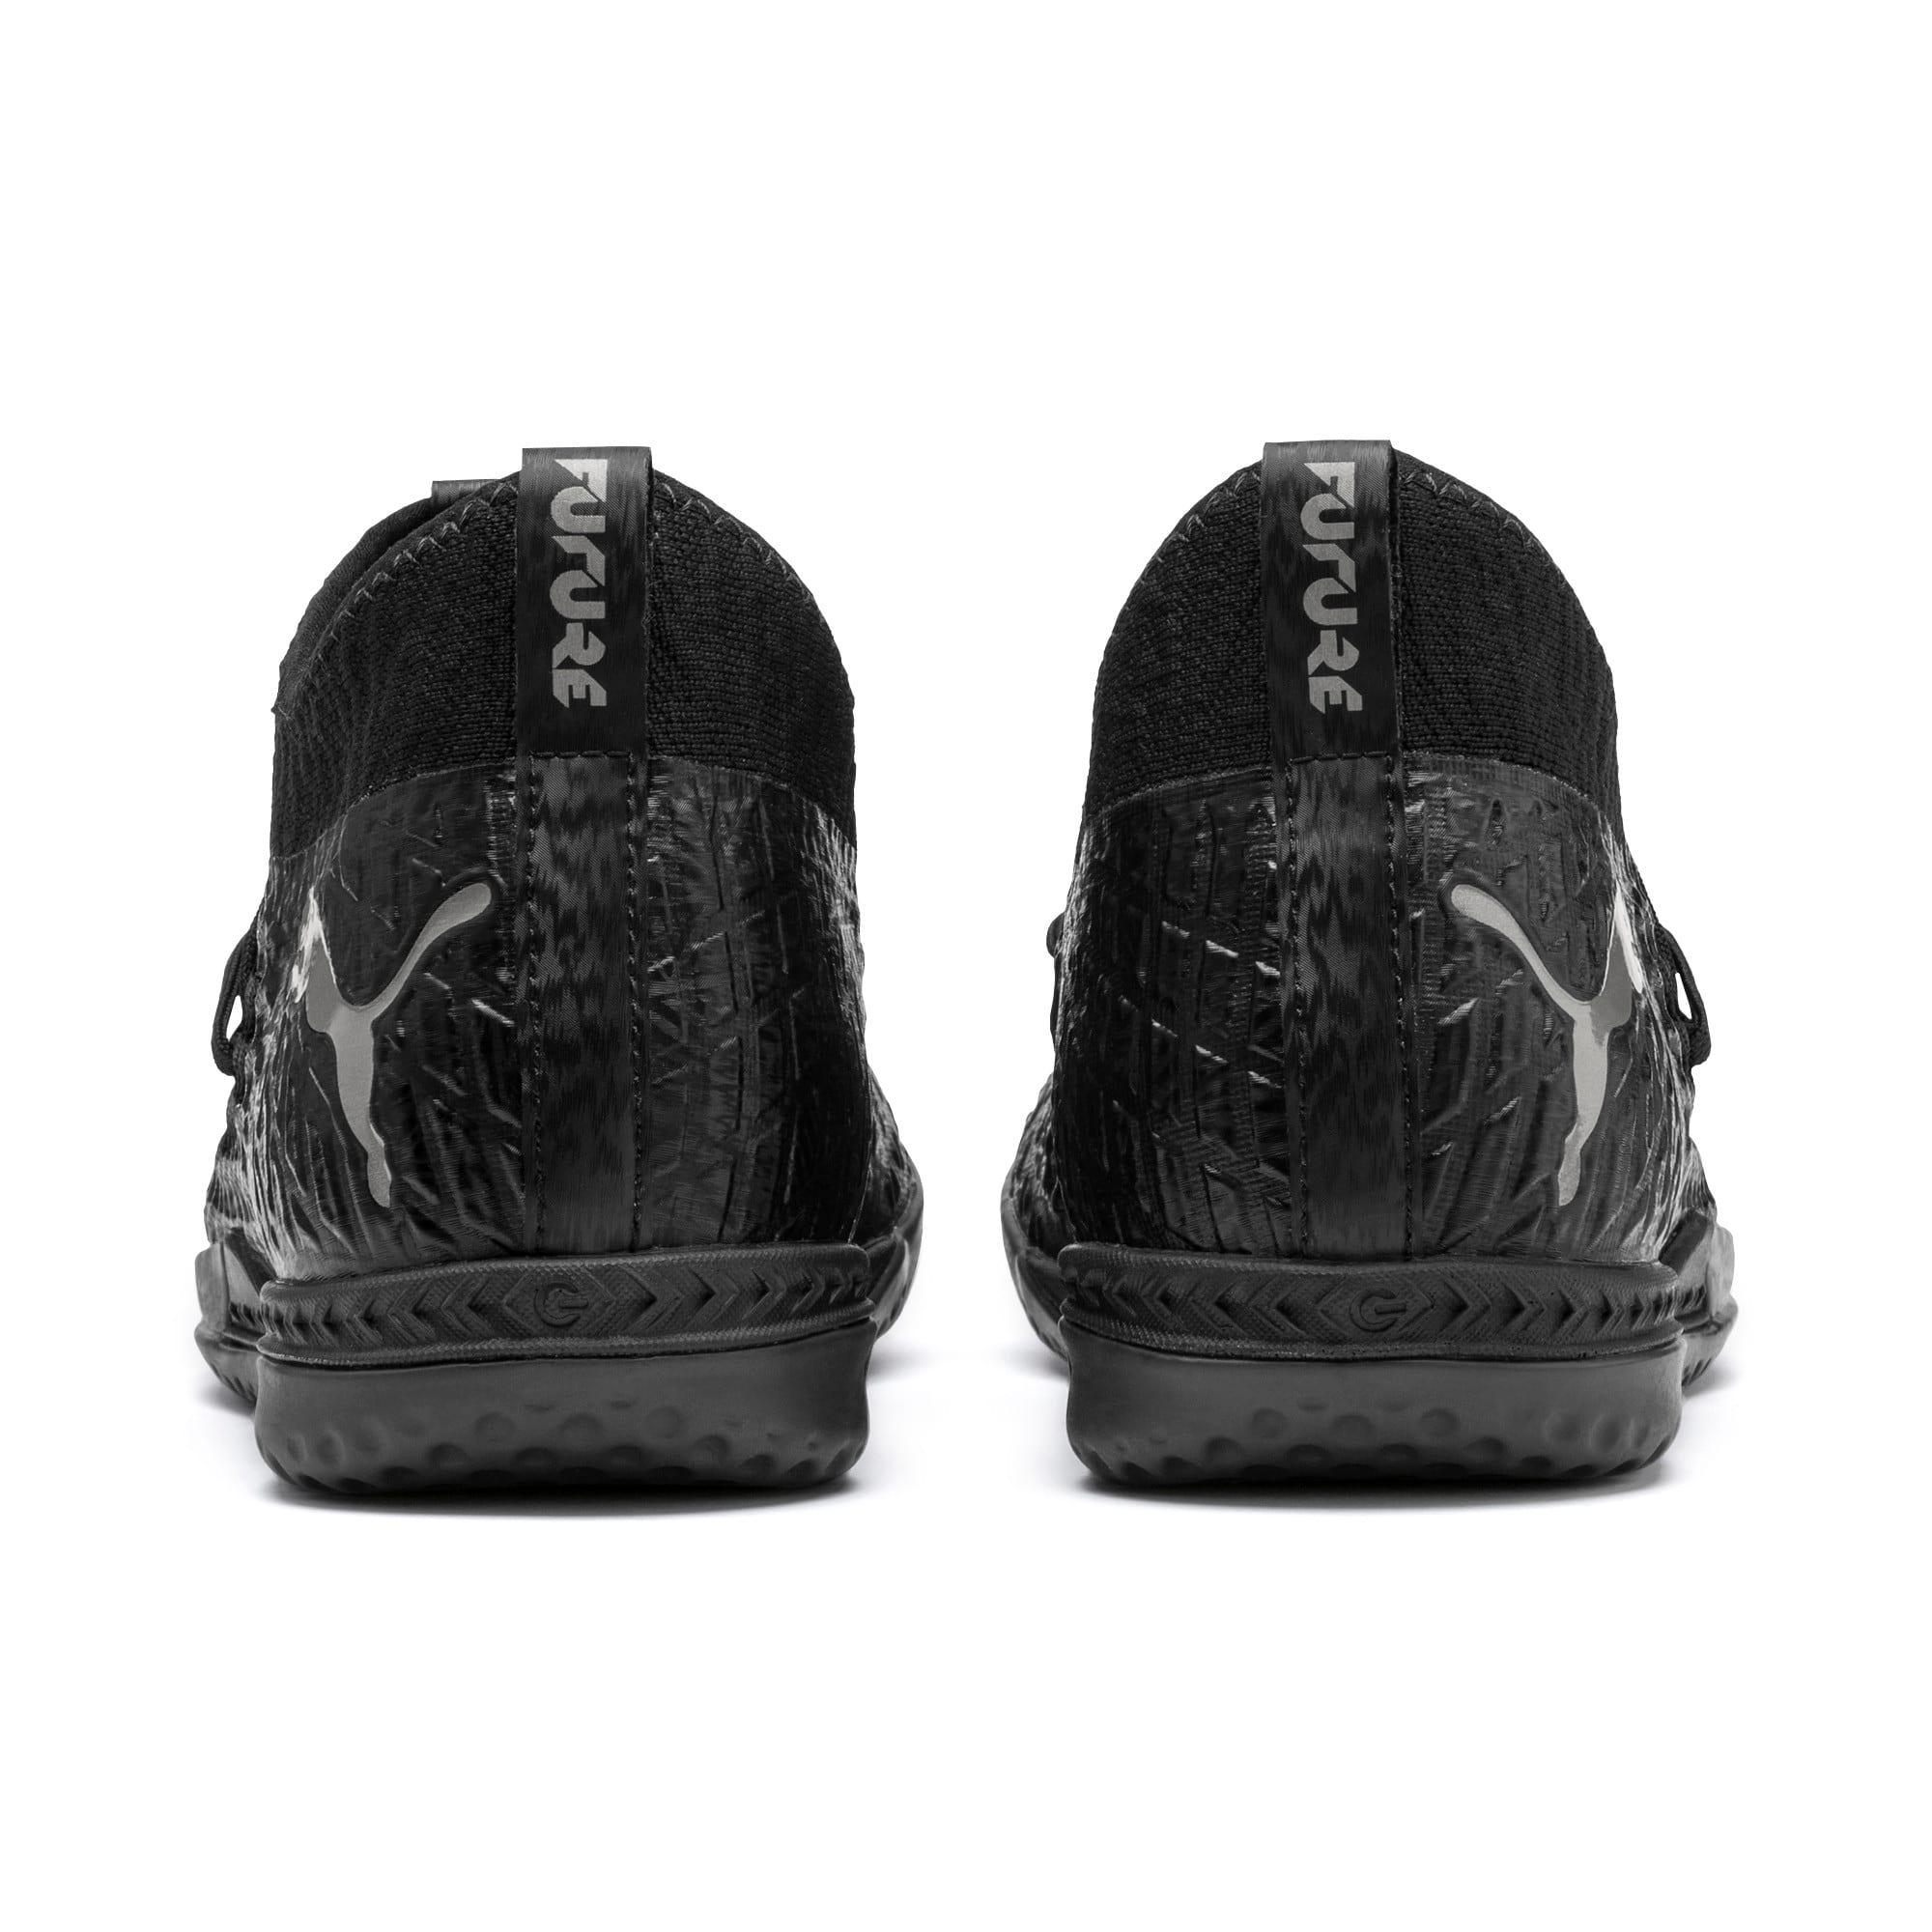 Thumbnail 4 of FUTURE 4.3 NETFIT IT Men's Soccer Shoes, Black-Black-Puma Aged Silver, medium